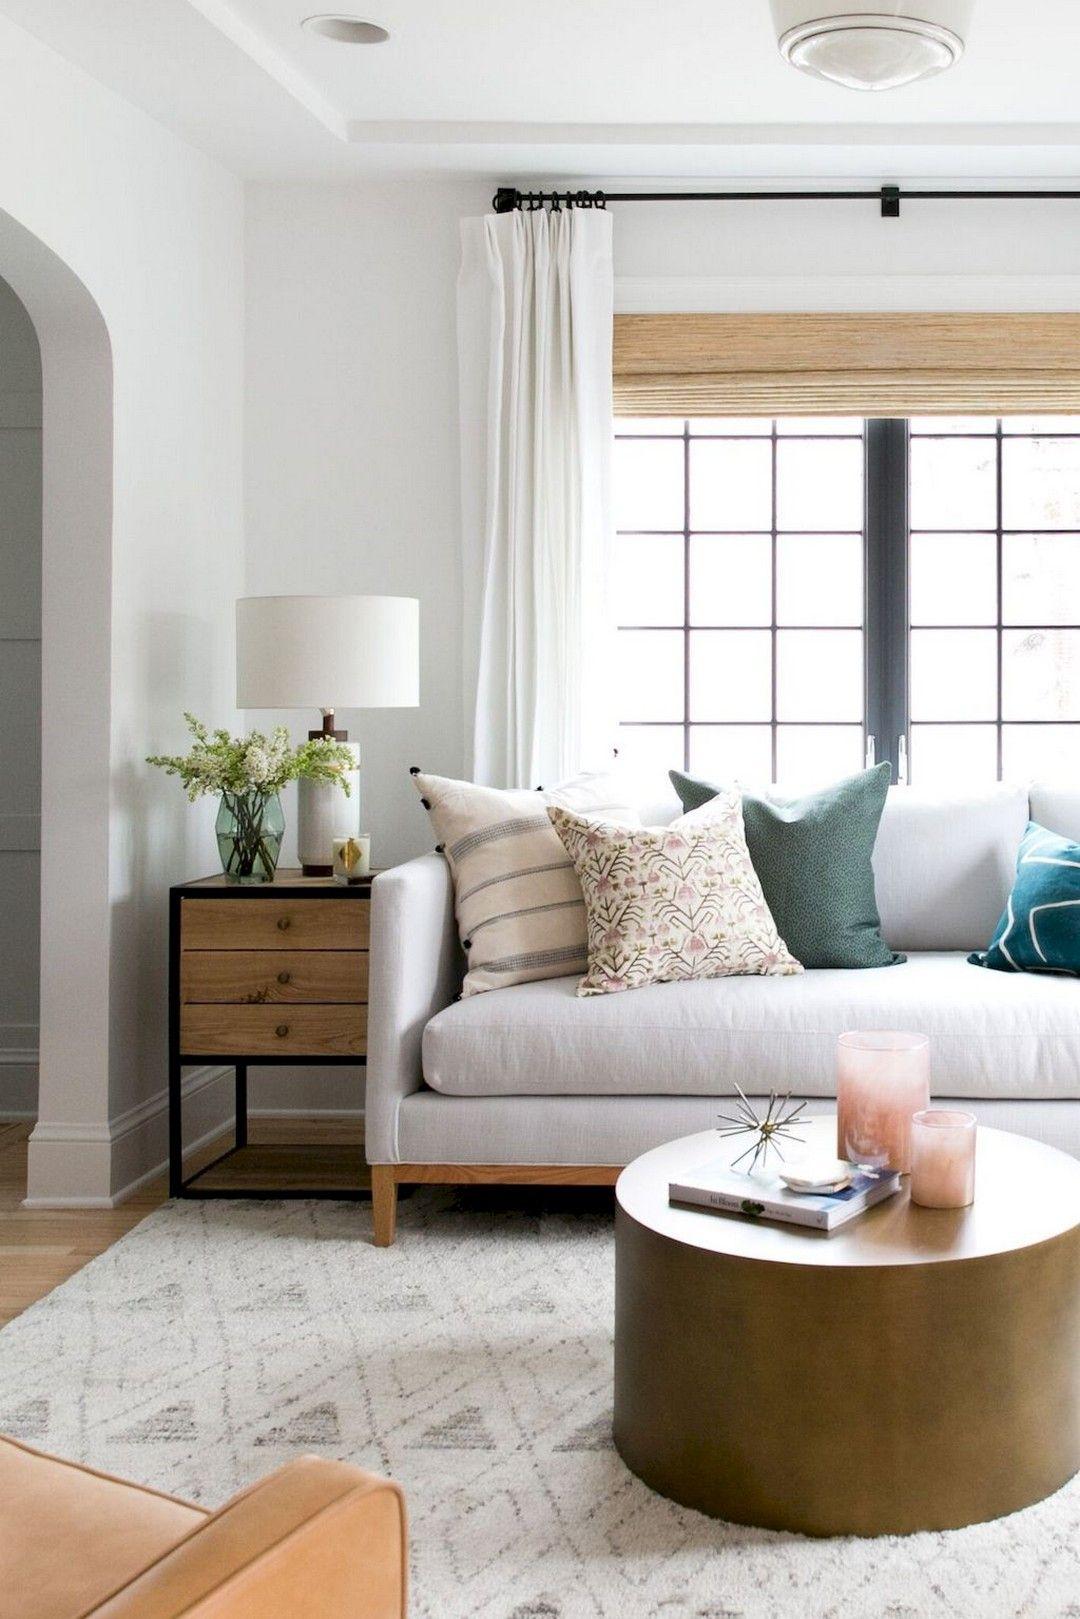 Attractive 51 Beautiful Neutral Living Room Design Ideas Https://www.decomagz.com